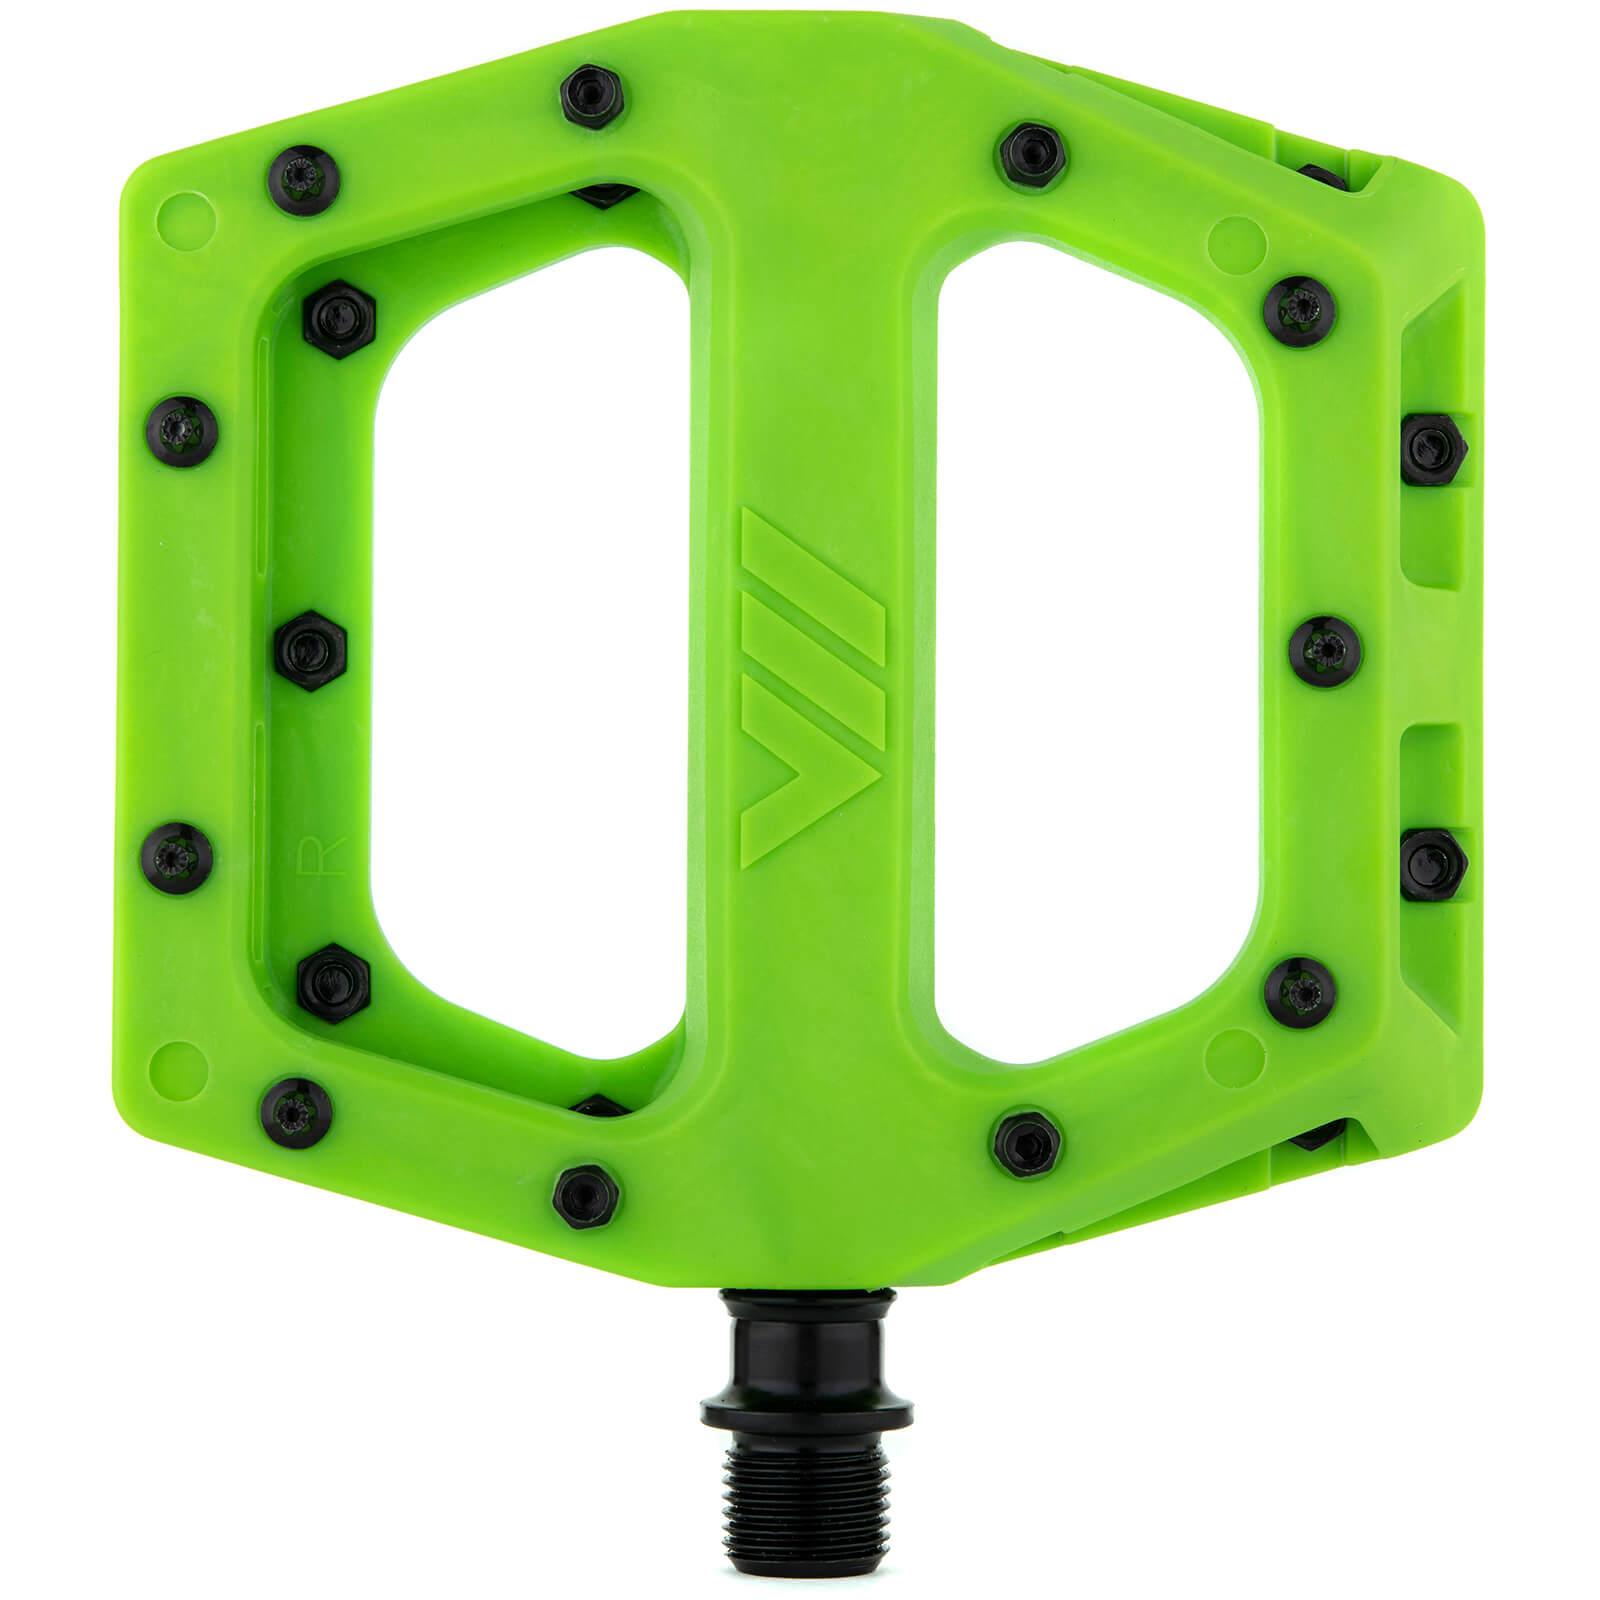 DMR V11 Flat Pedal - Green